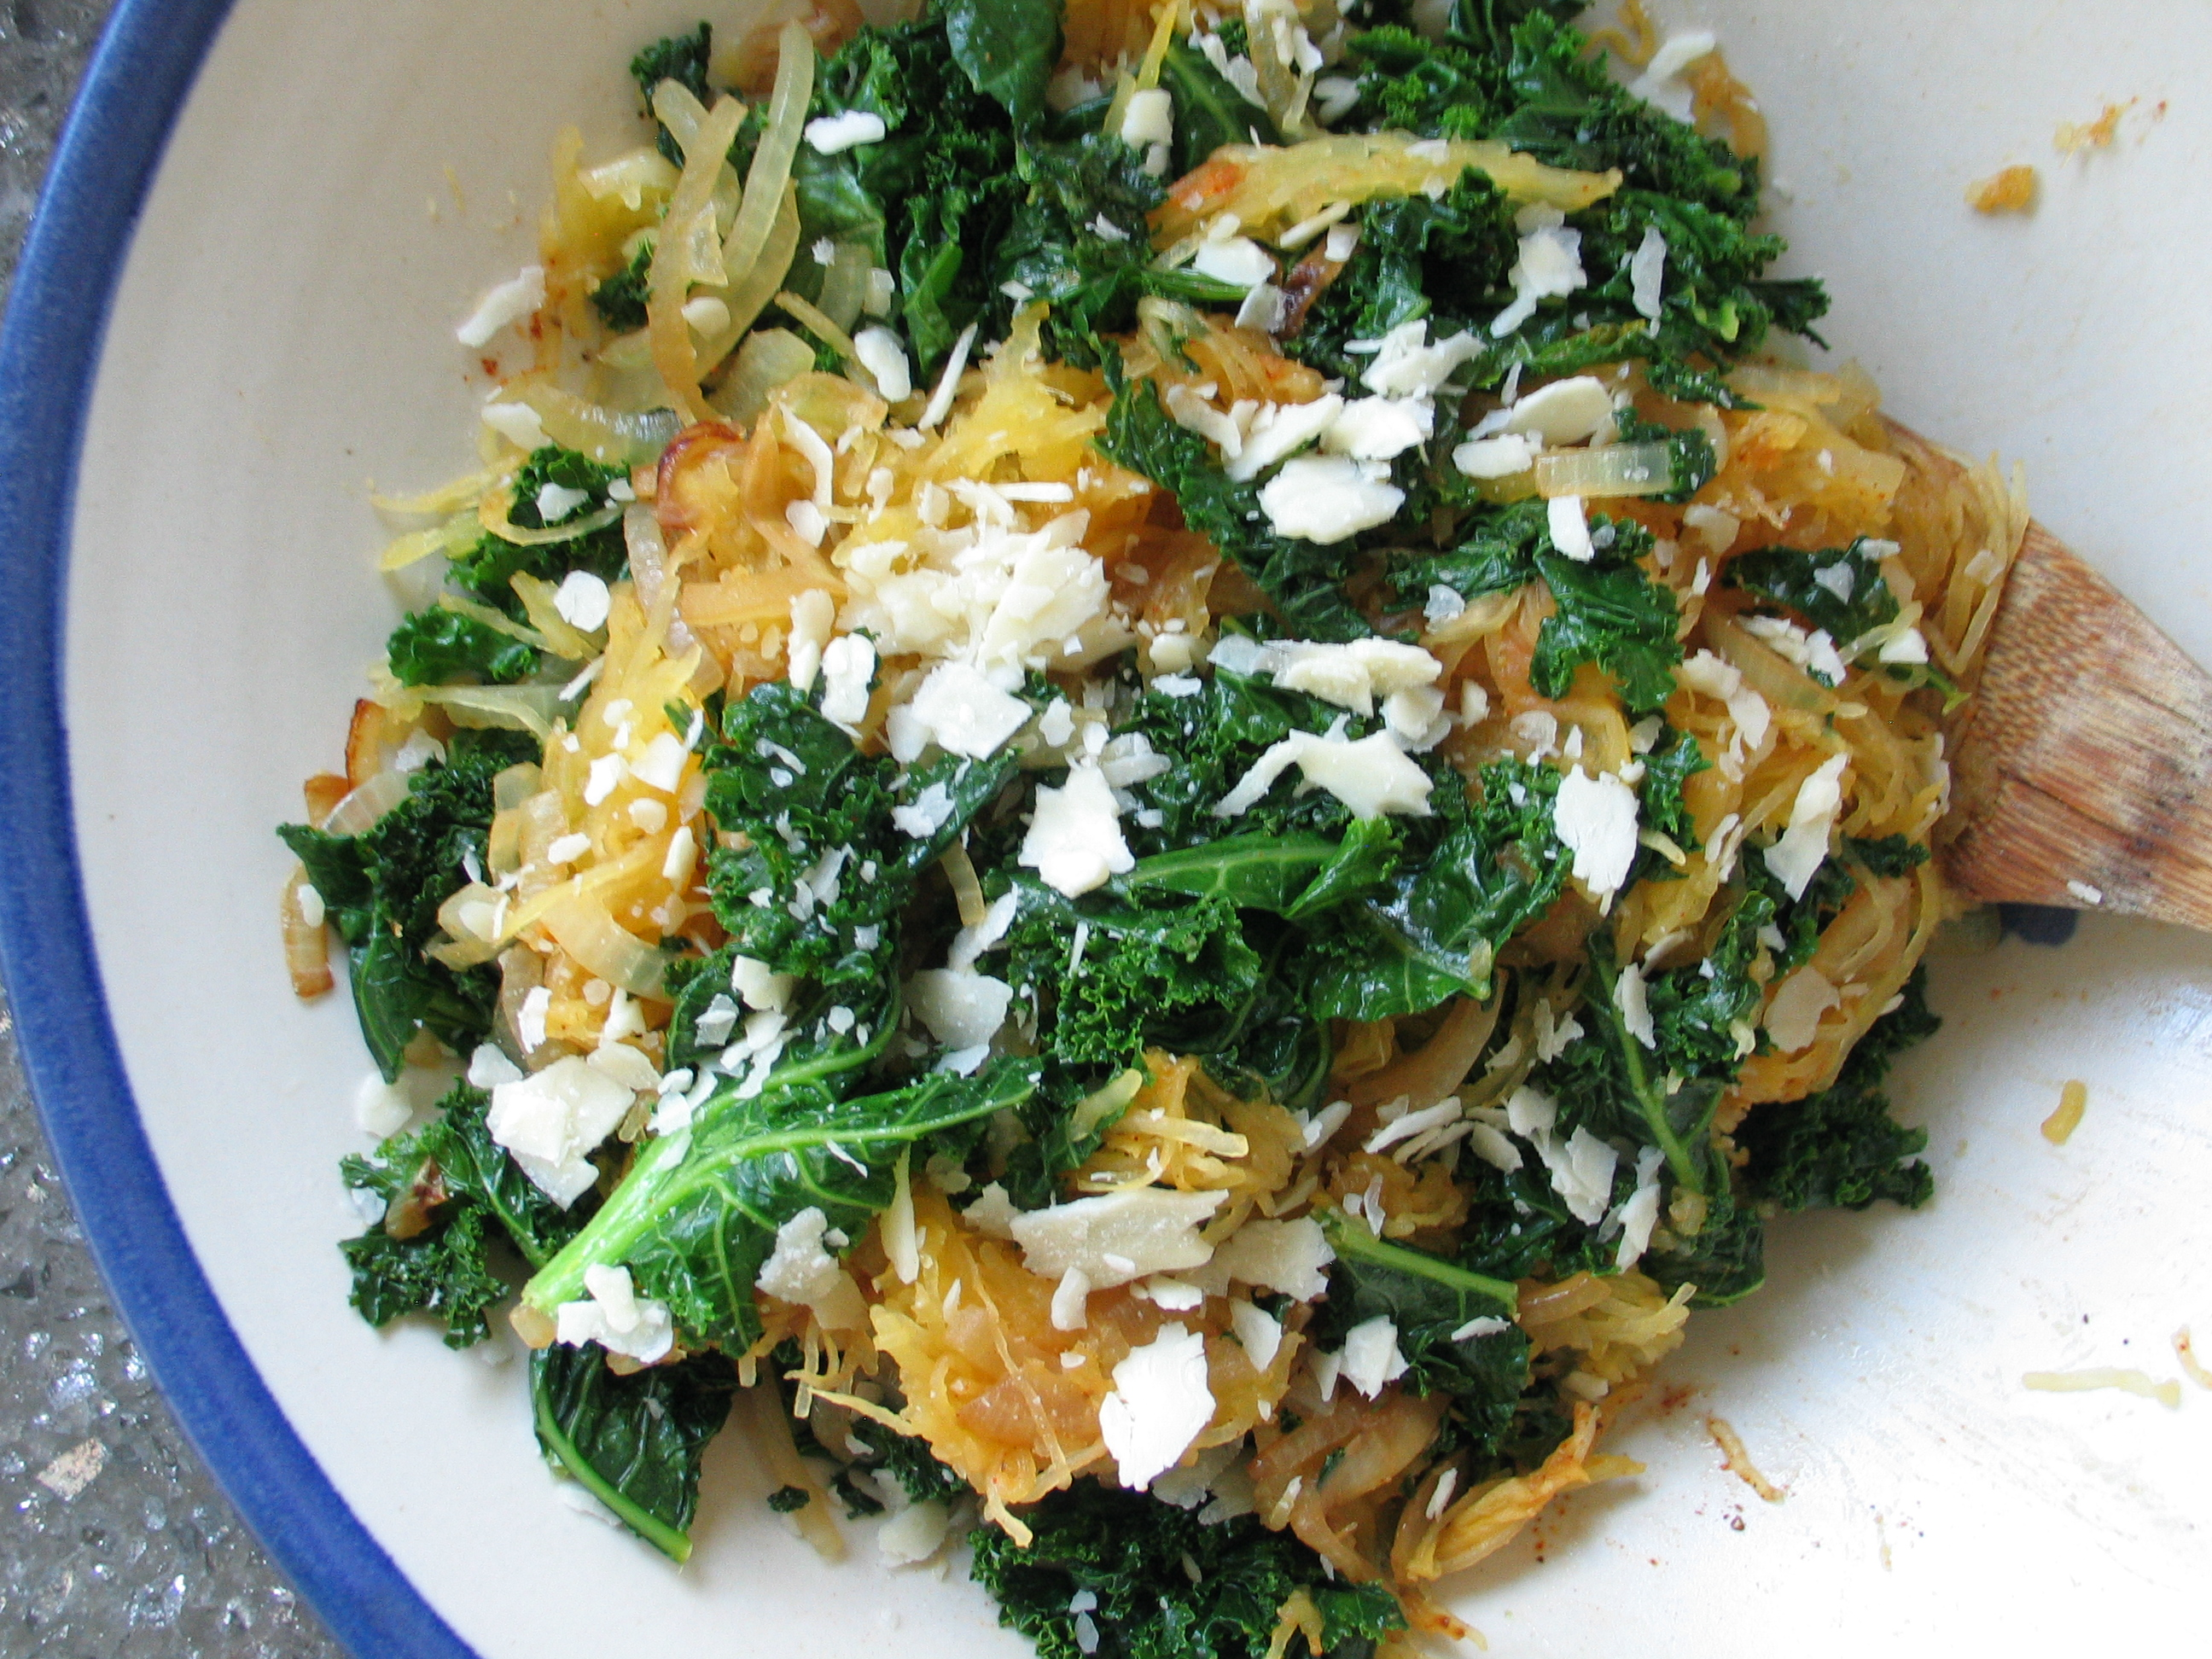 Roasted Squash and Kale